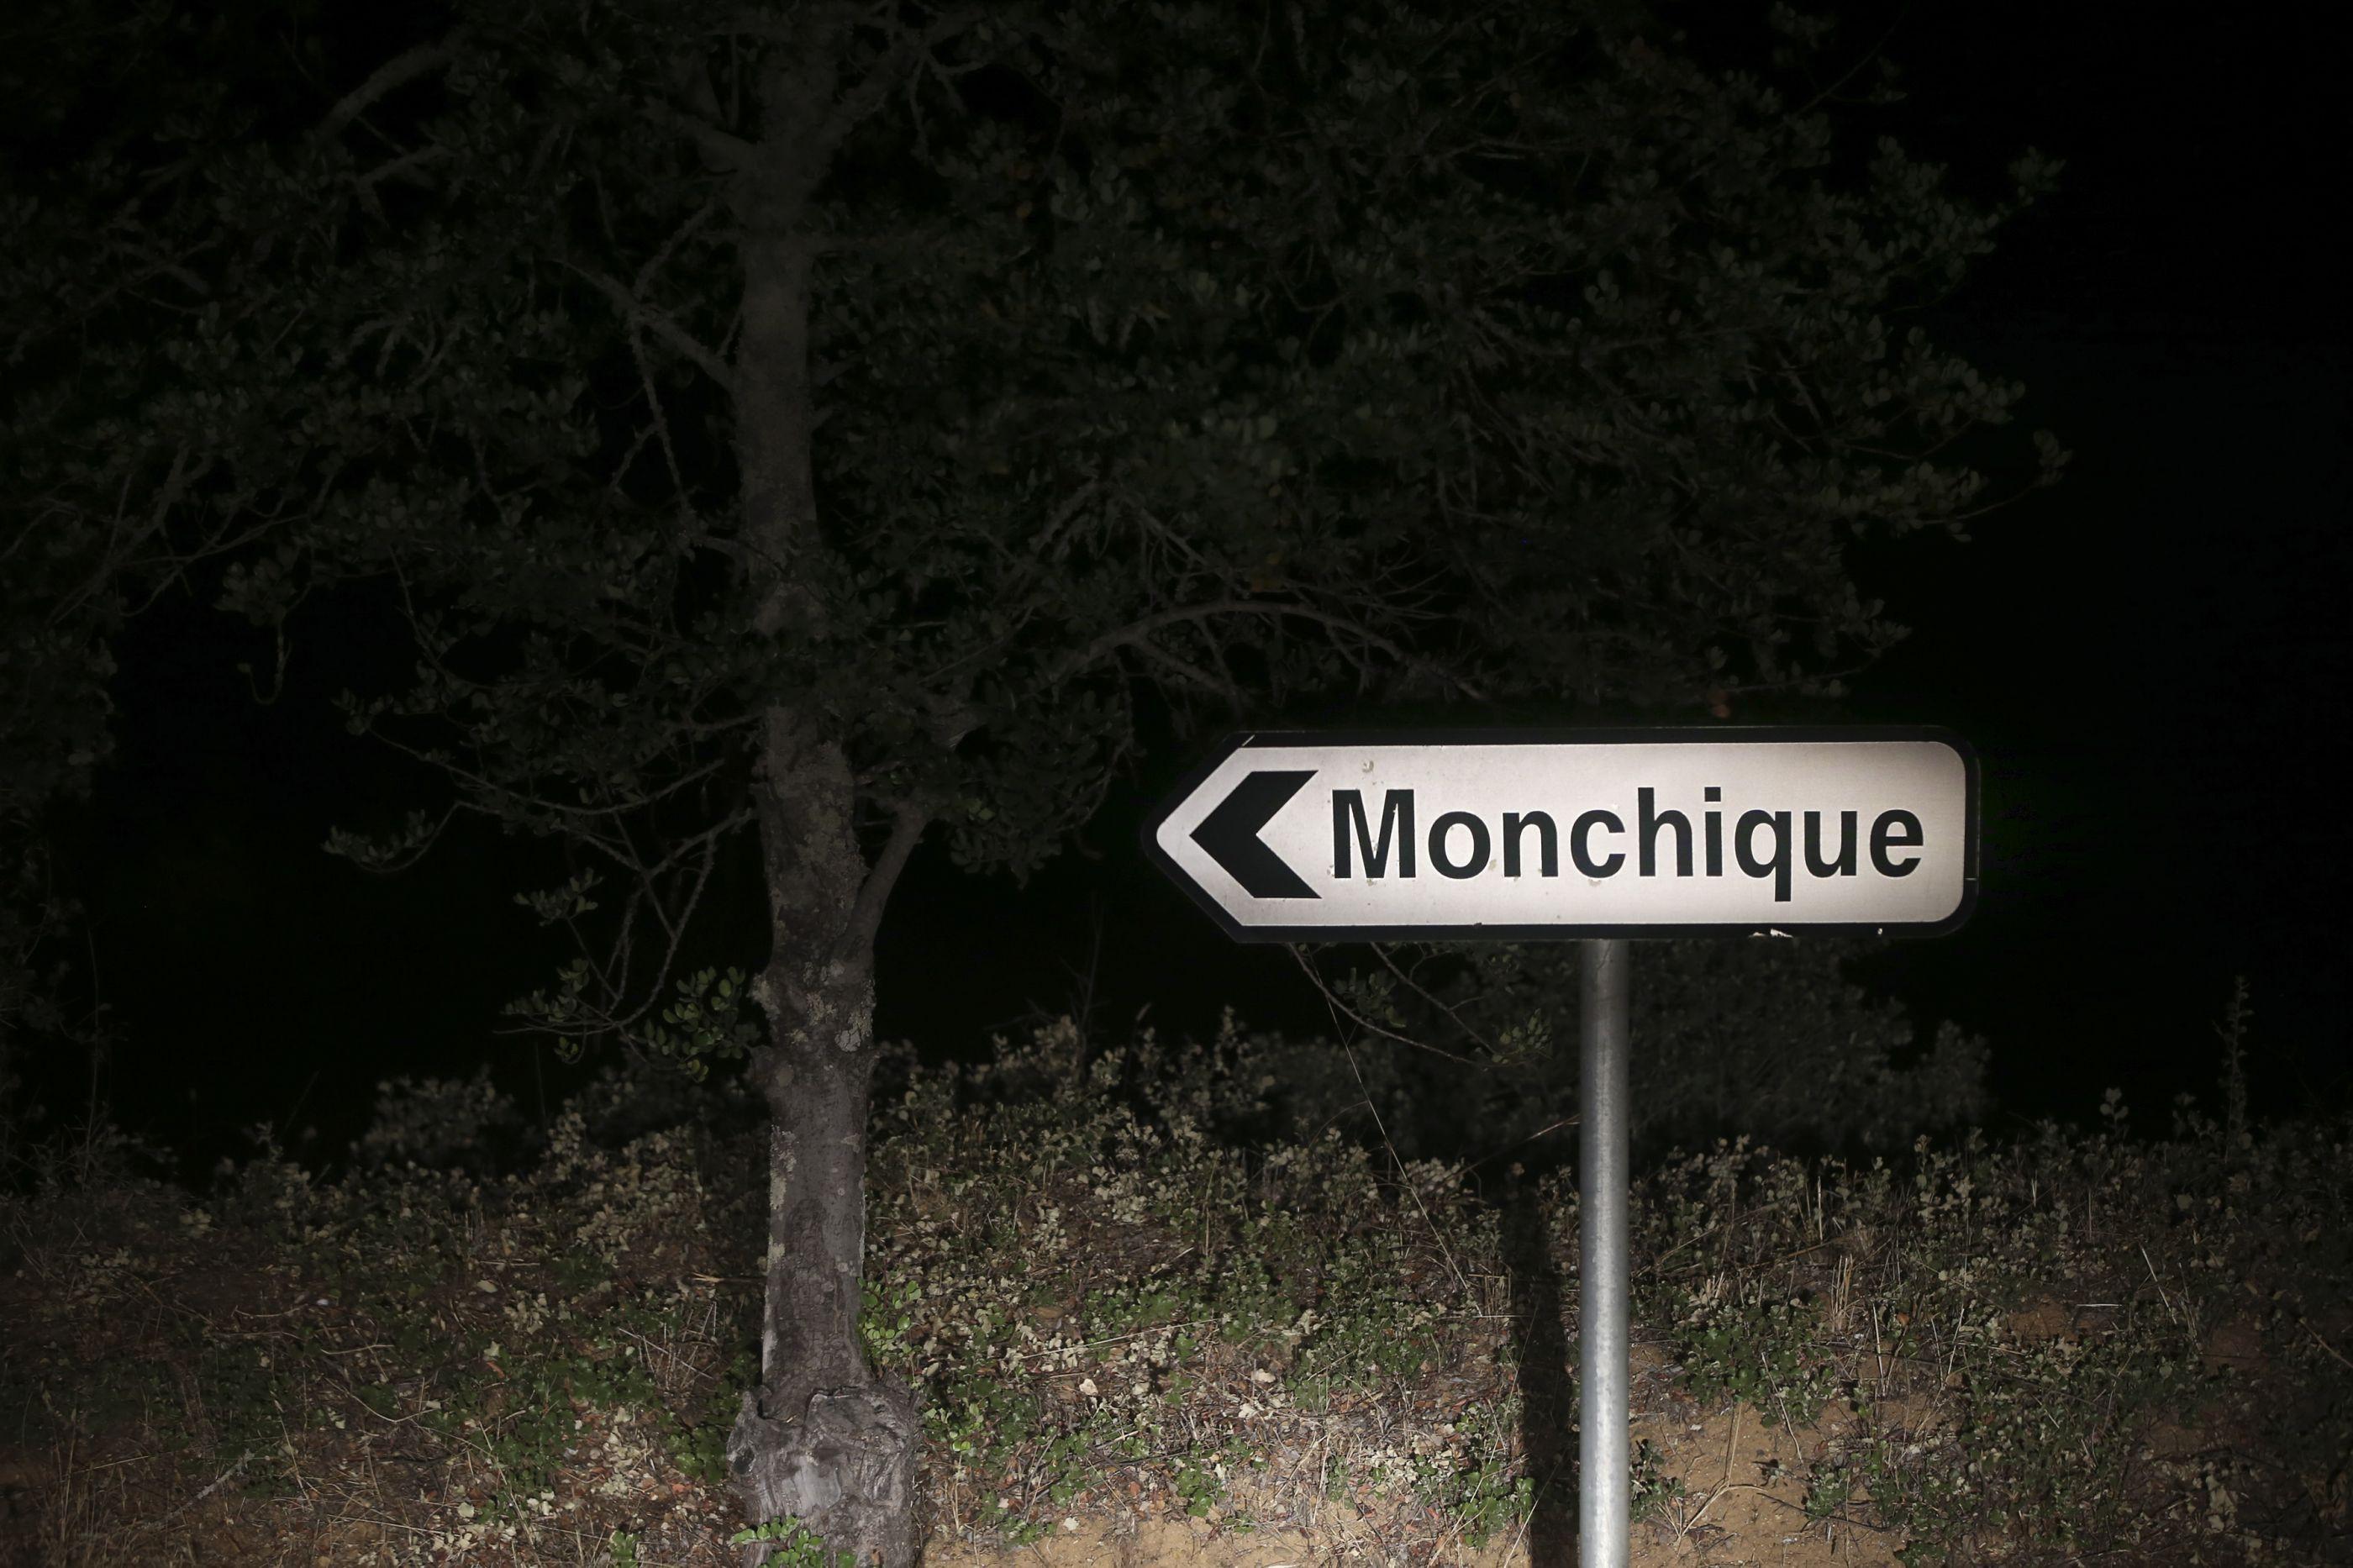 AR recomenda procedimento simplificado para apoiar vítimas de Monchique